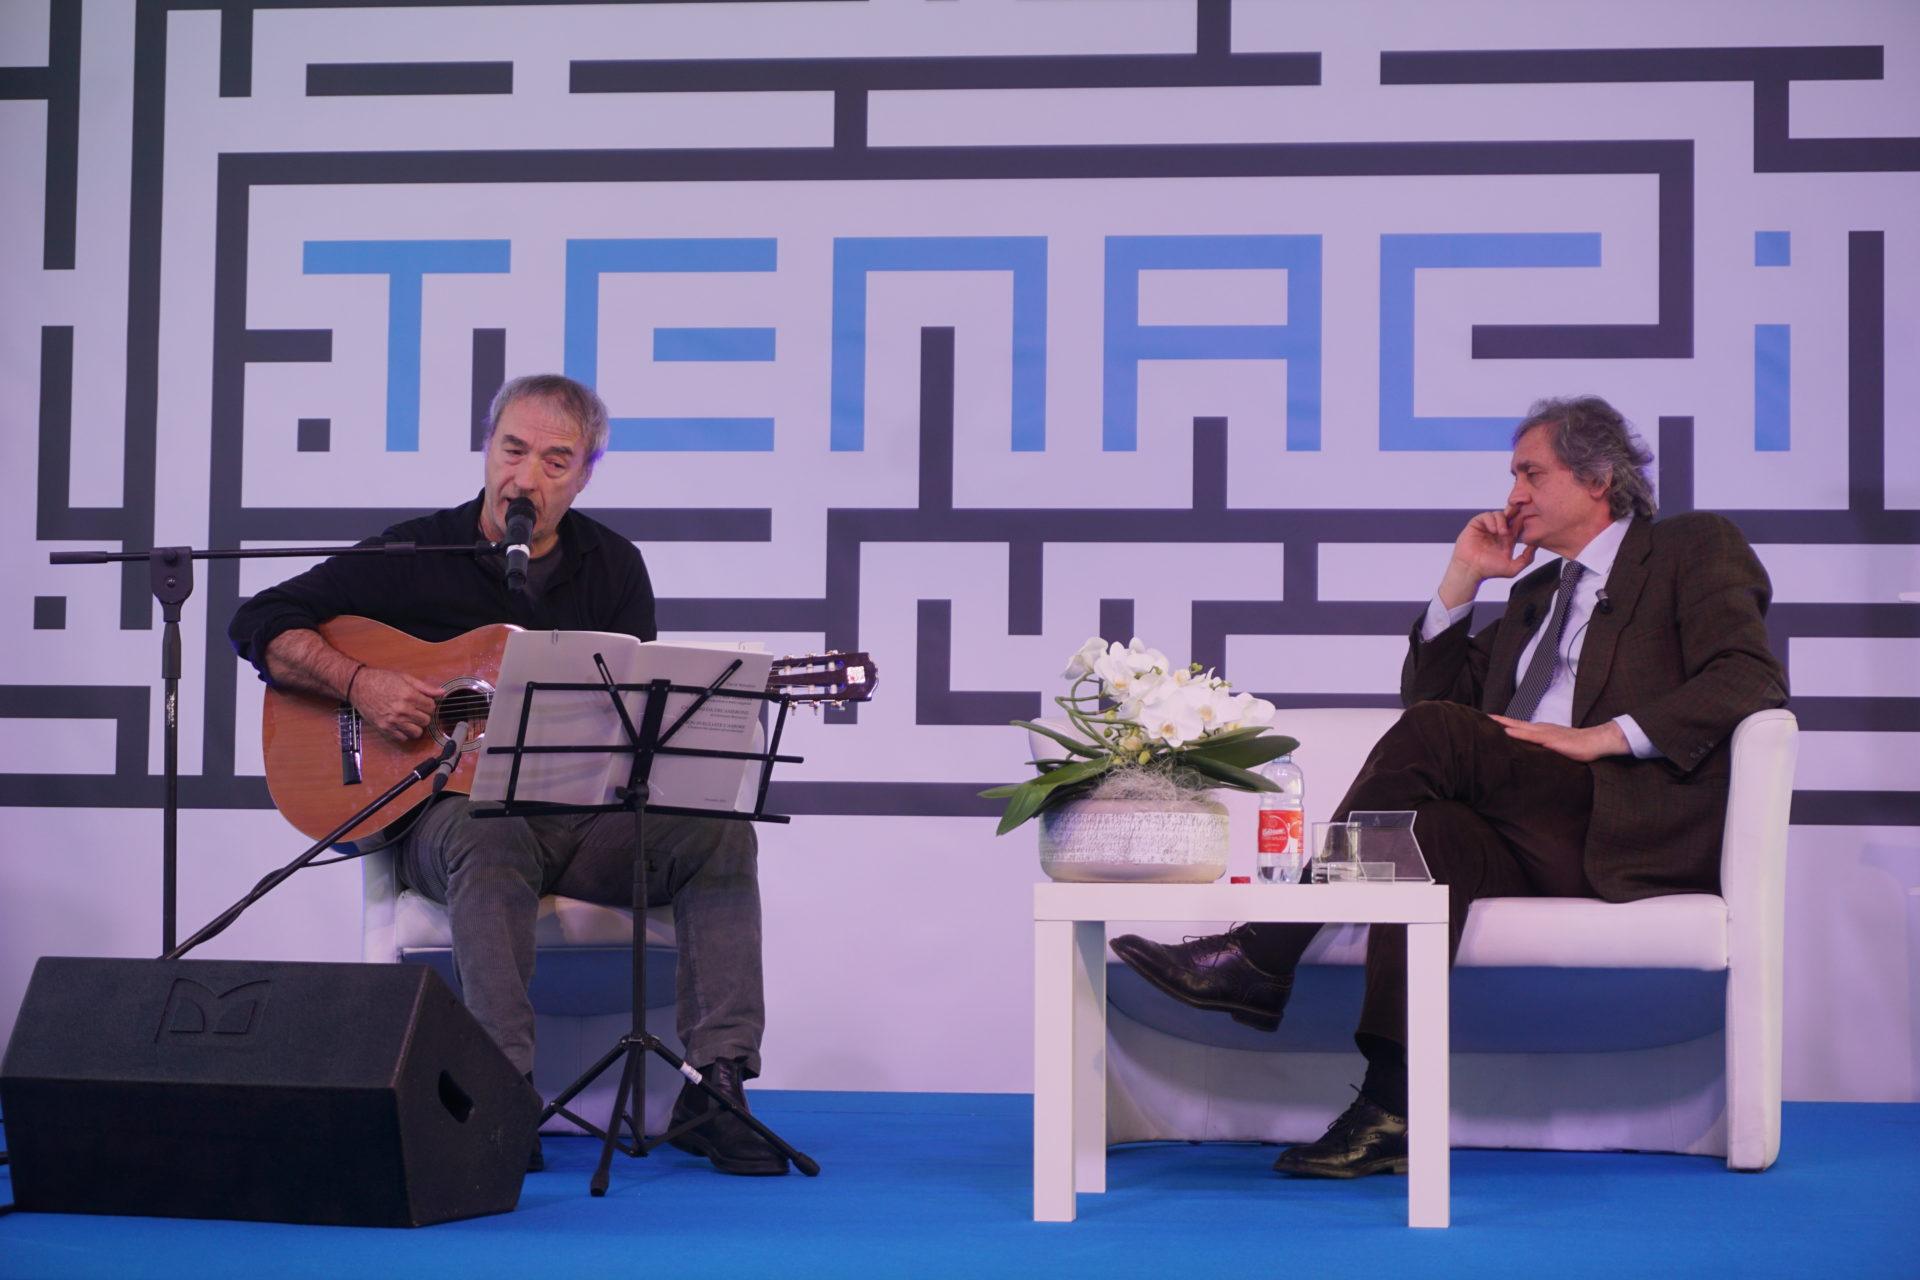 David Riondino e Arnaldo Colasanti - Les Mots 2019